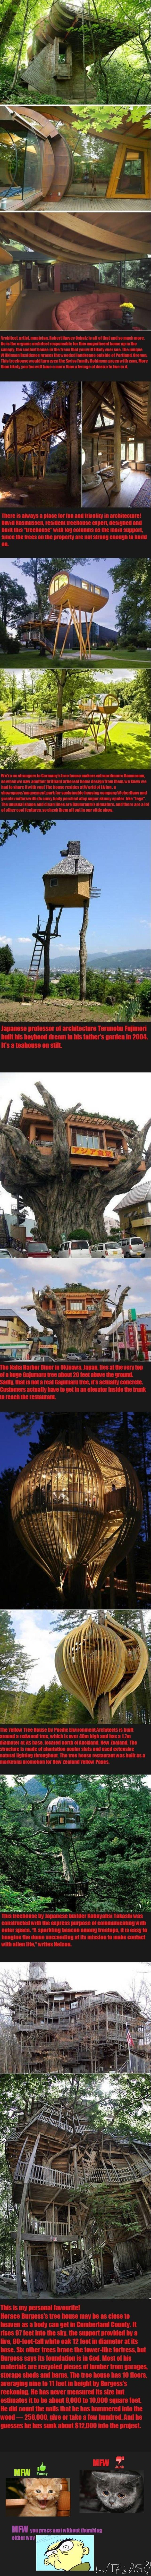 Amazing Tree Houses. Mmmmmm..... bitch please